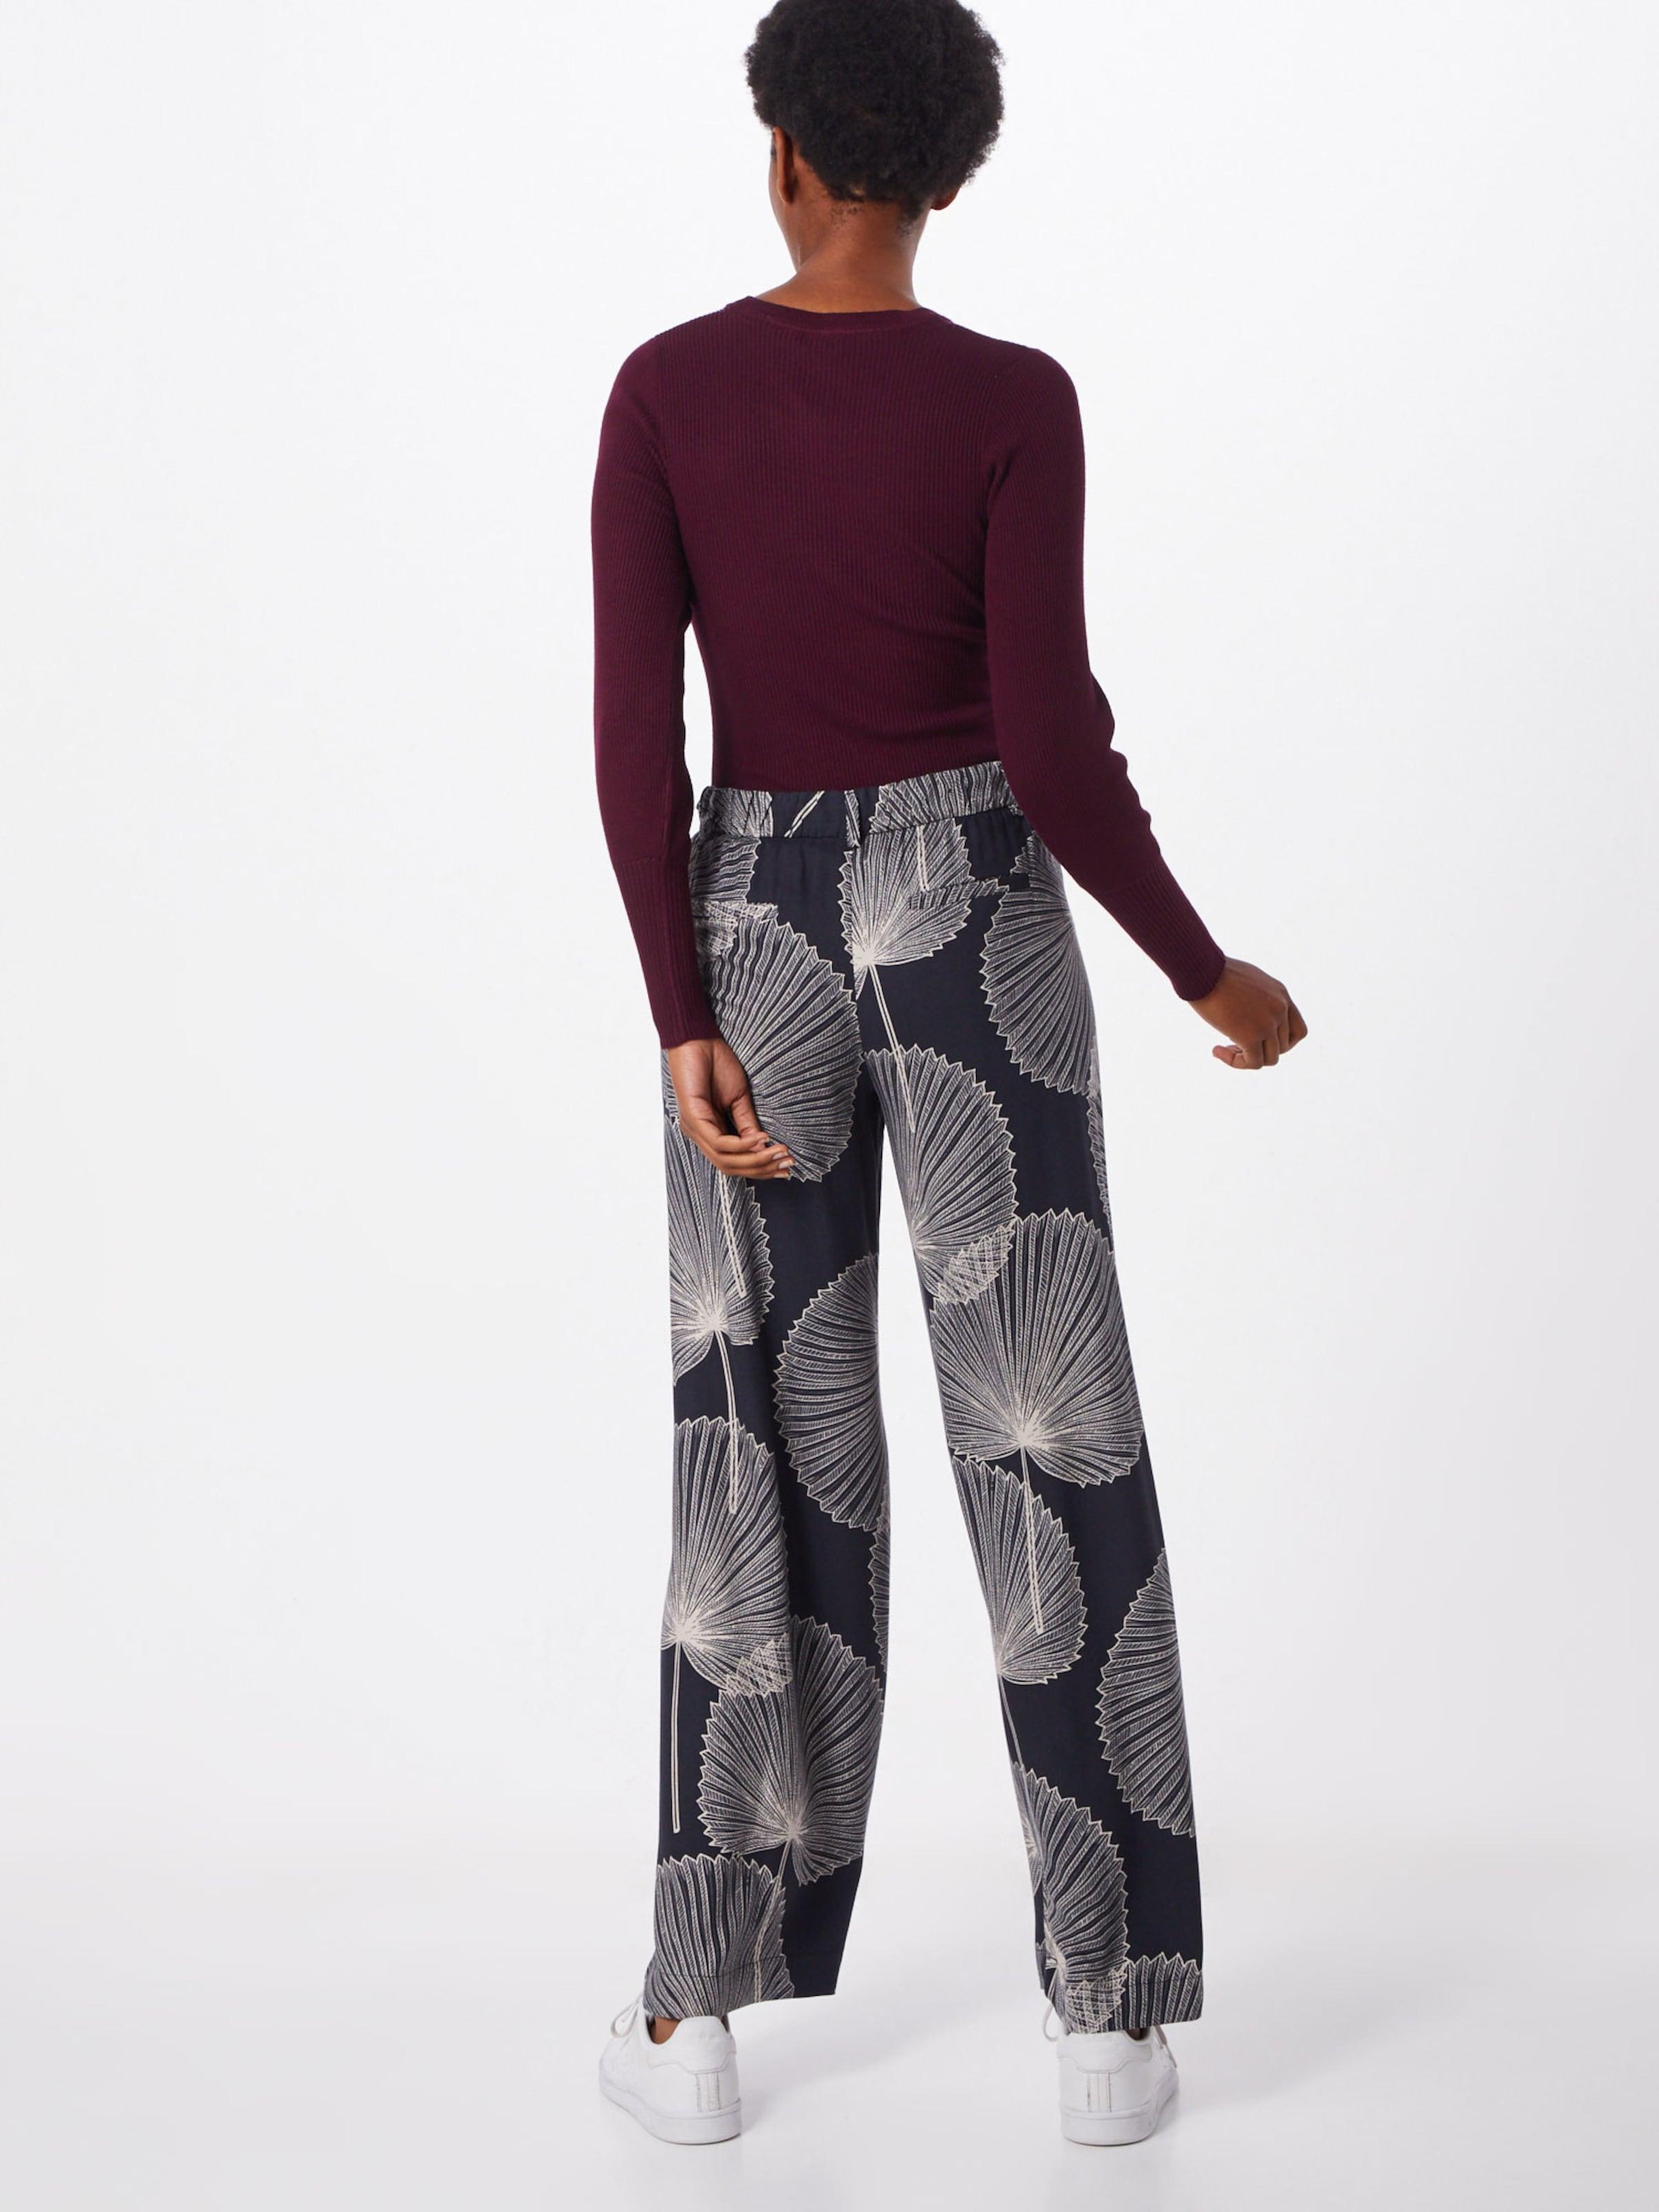 'printedstraight' Esprit En Collection Noir Pantalon 0Ok8Pnw